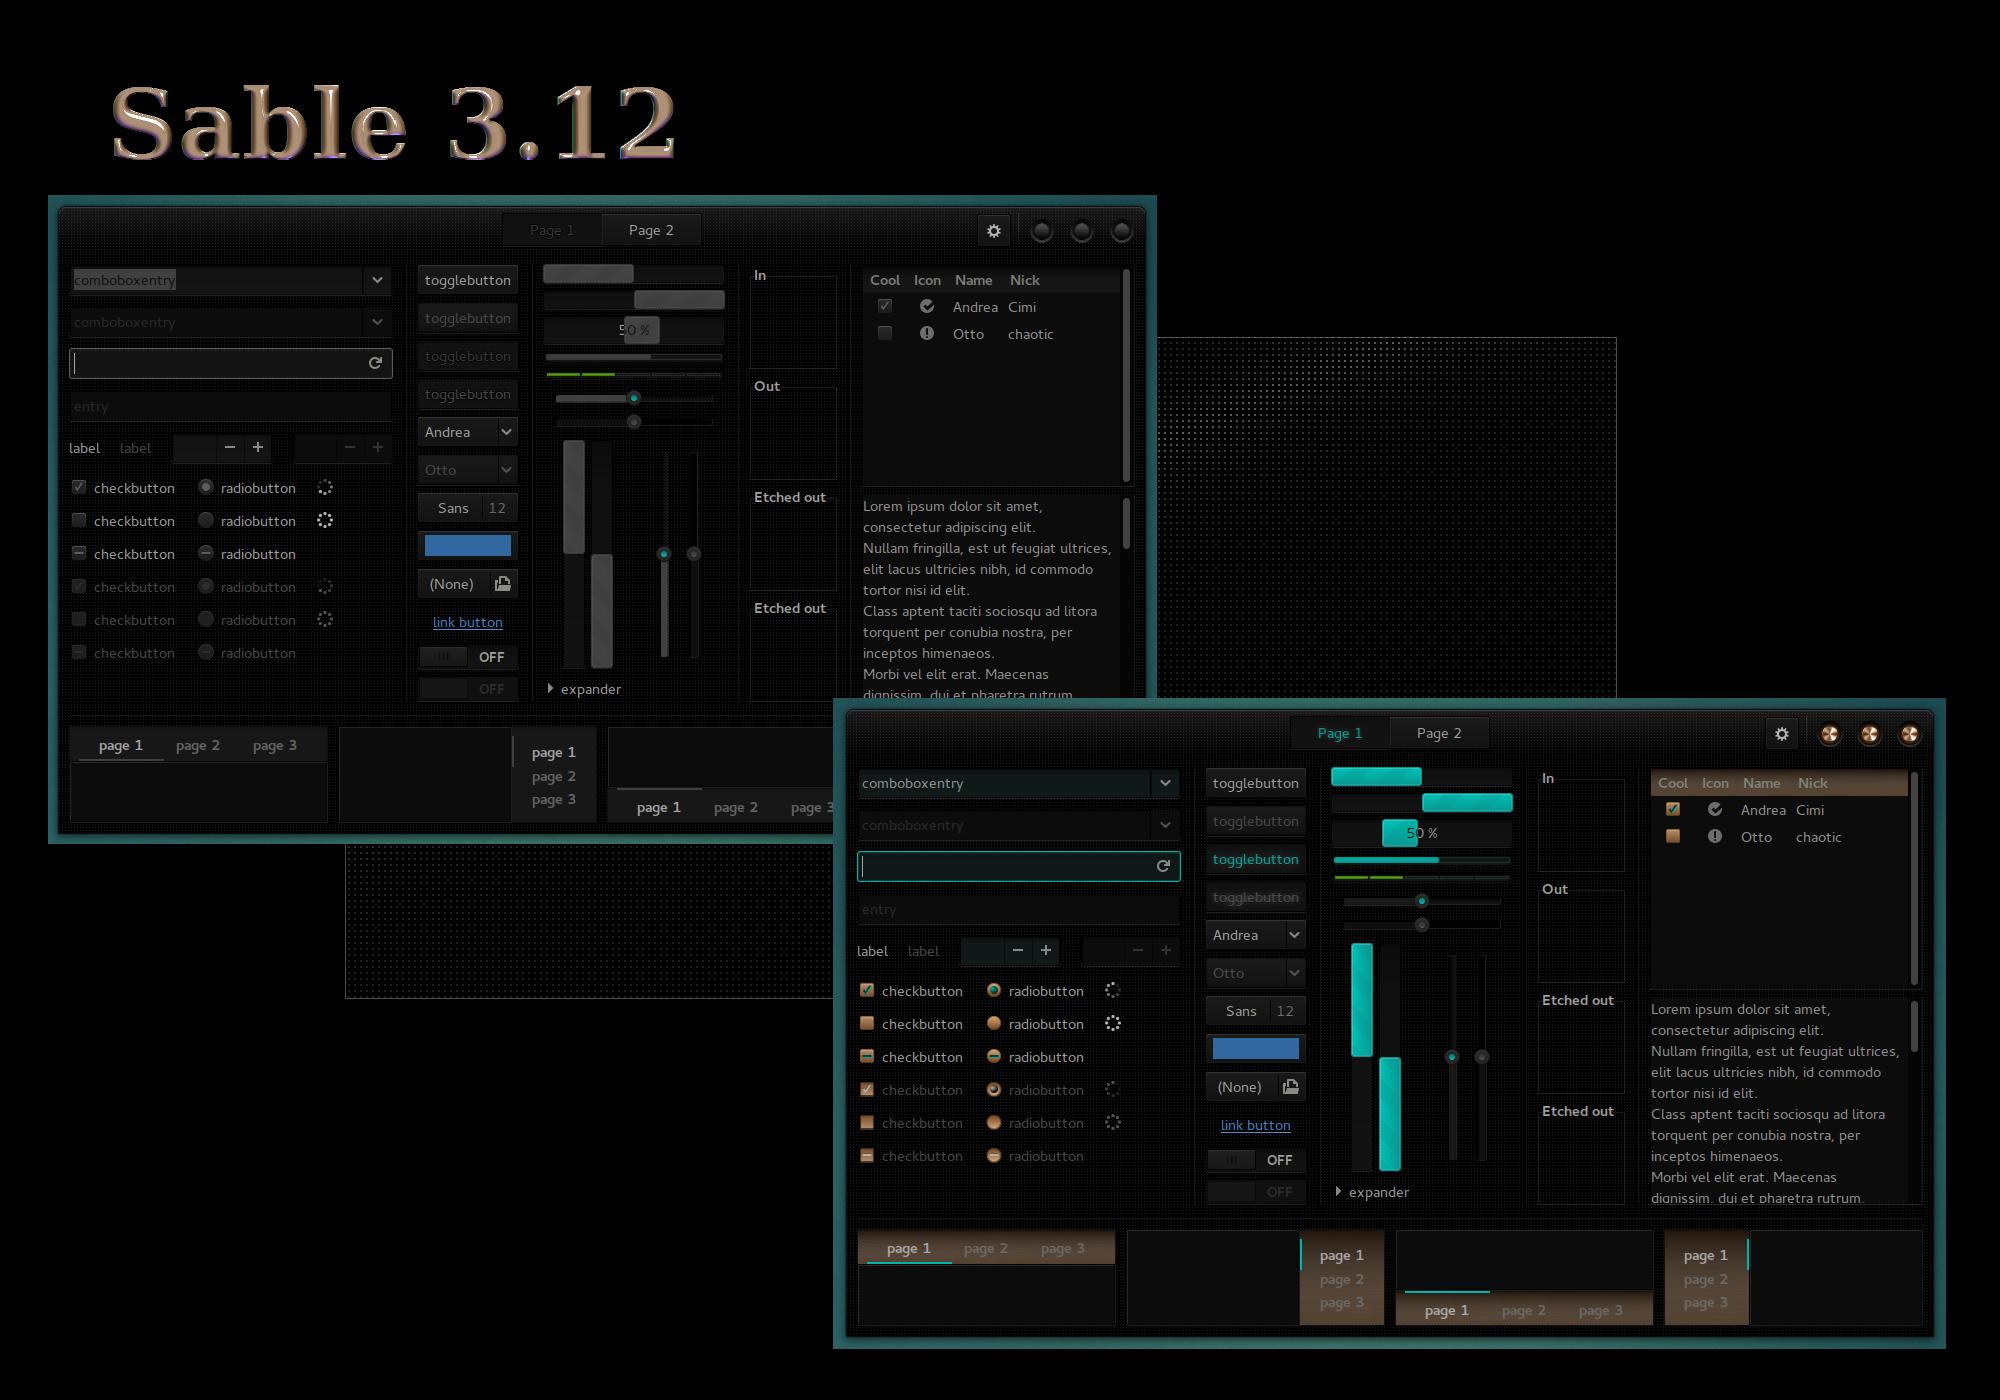 Sable-3.12 09.03252015